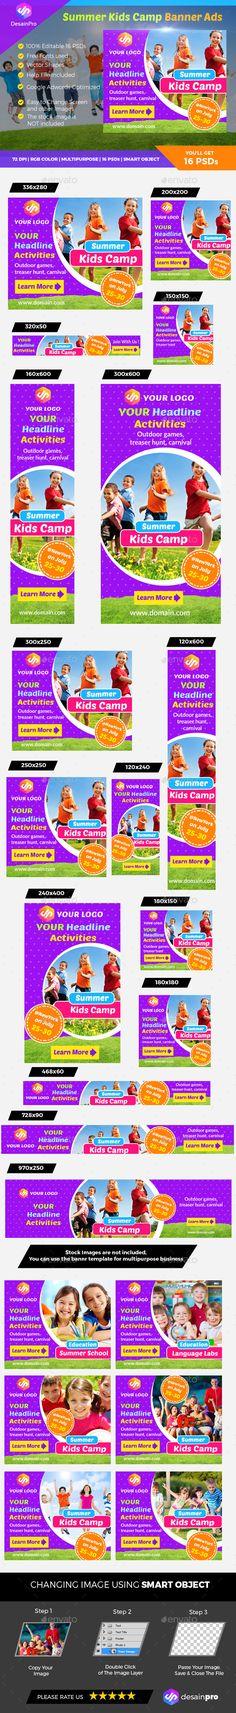 Summer Kids Camp Banner - Banners & Ads Web Elements Download here : https://graphicriver.net/item/summer-kids-camp-banner/19594141?s_rank=66&ref=Al-fatih